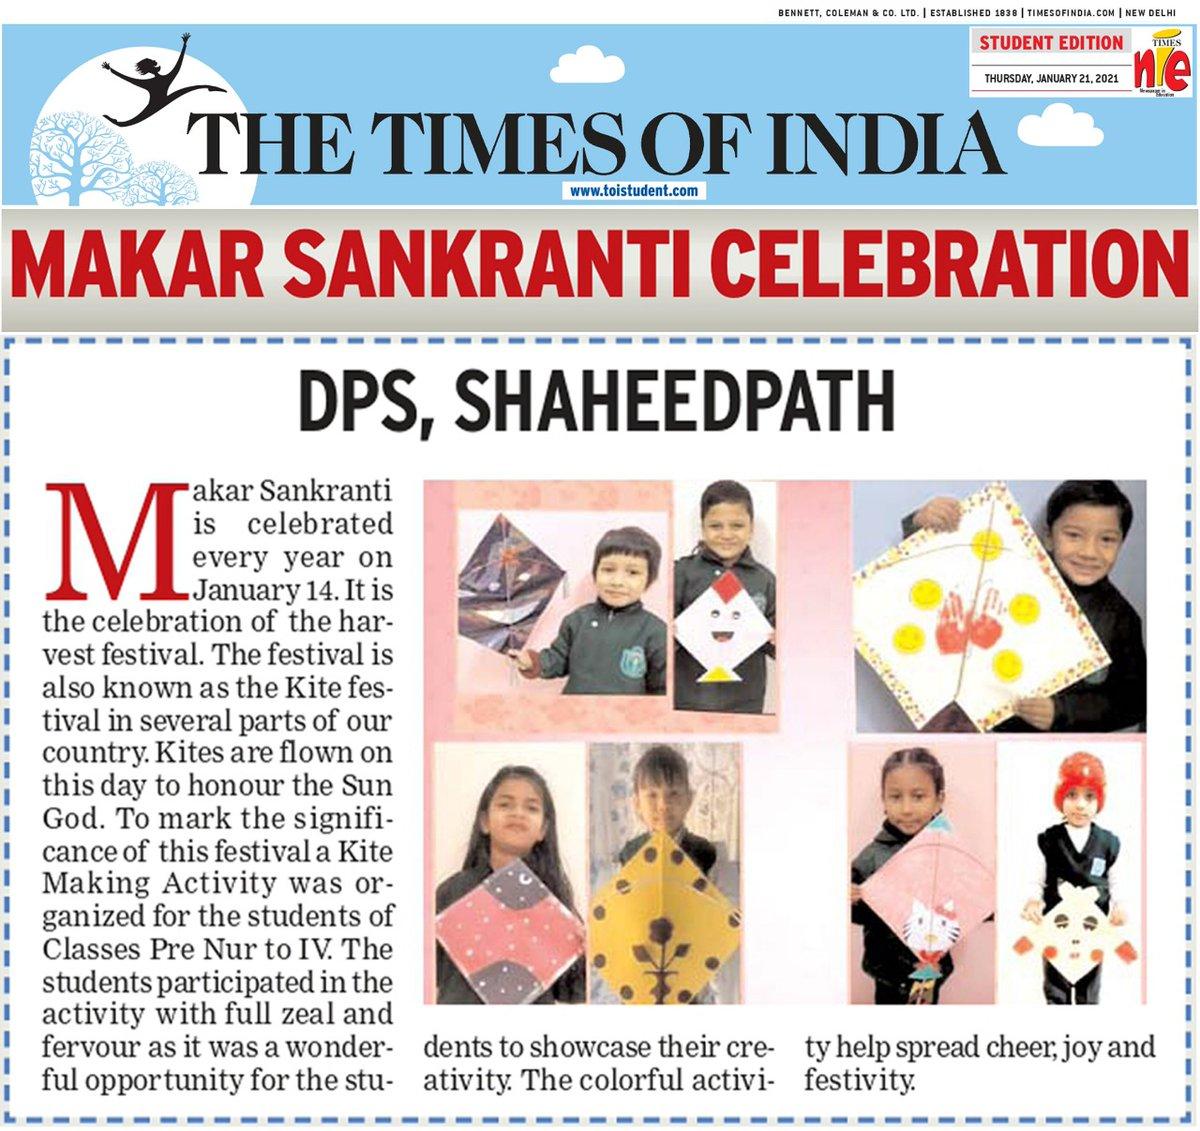 Makar Sankranti Celebration at DPS Shaheedpath covered in TOI. #dpslko #dpsshaheedpath #makarsankranti #presscoverage #toi